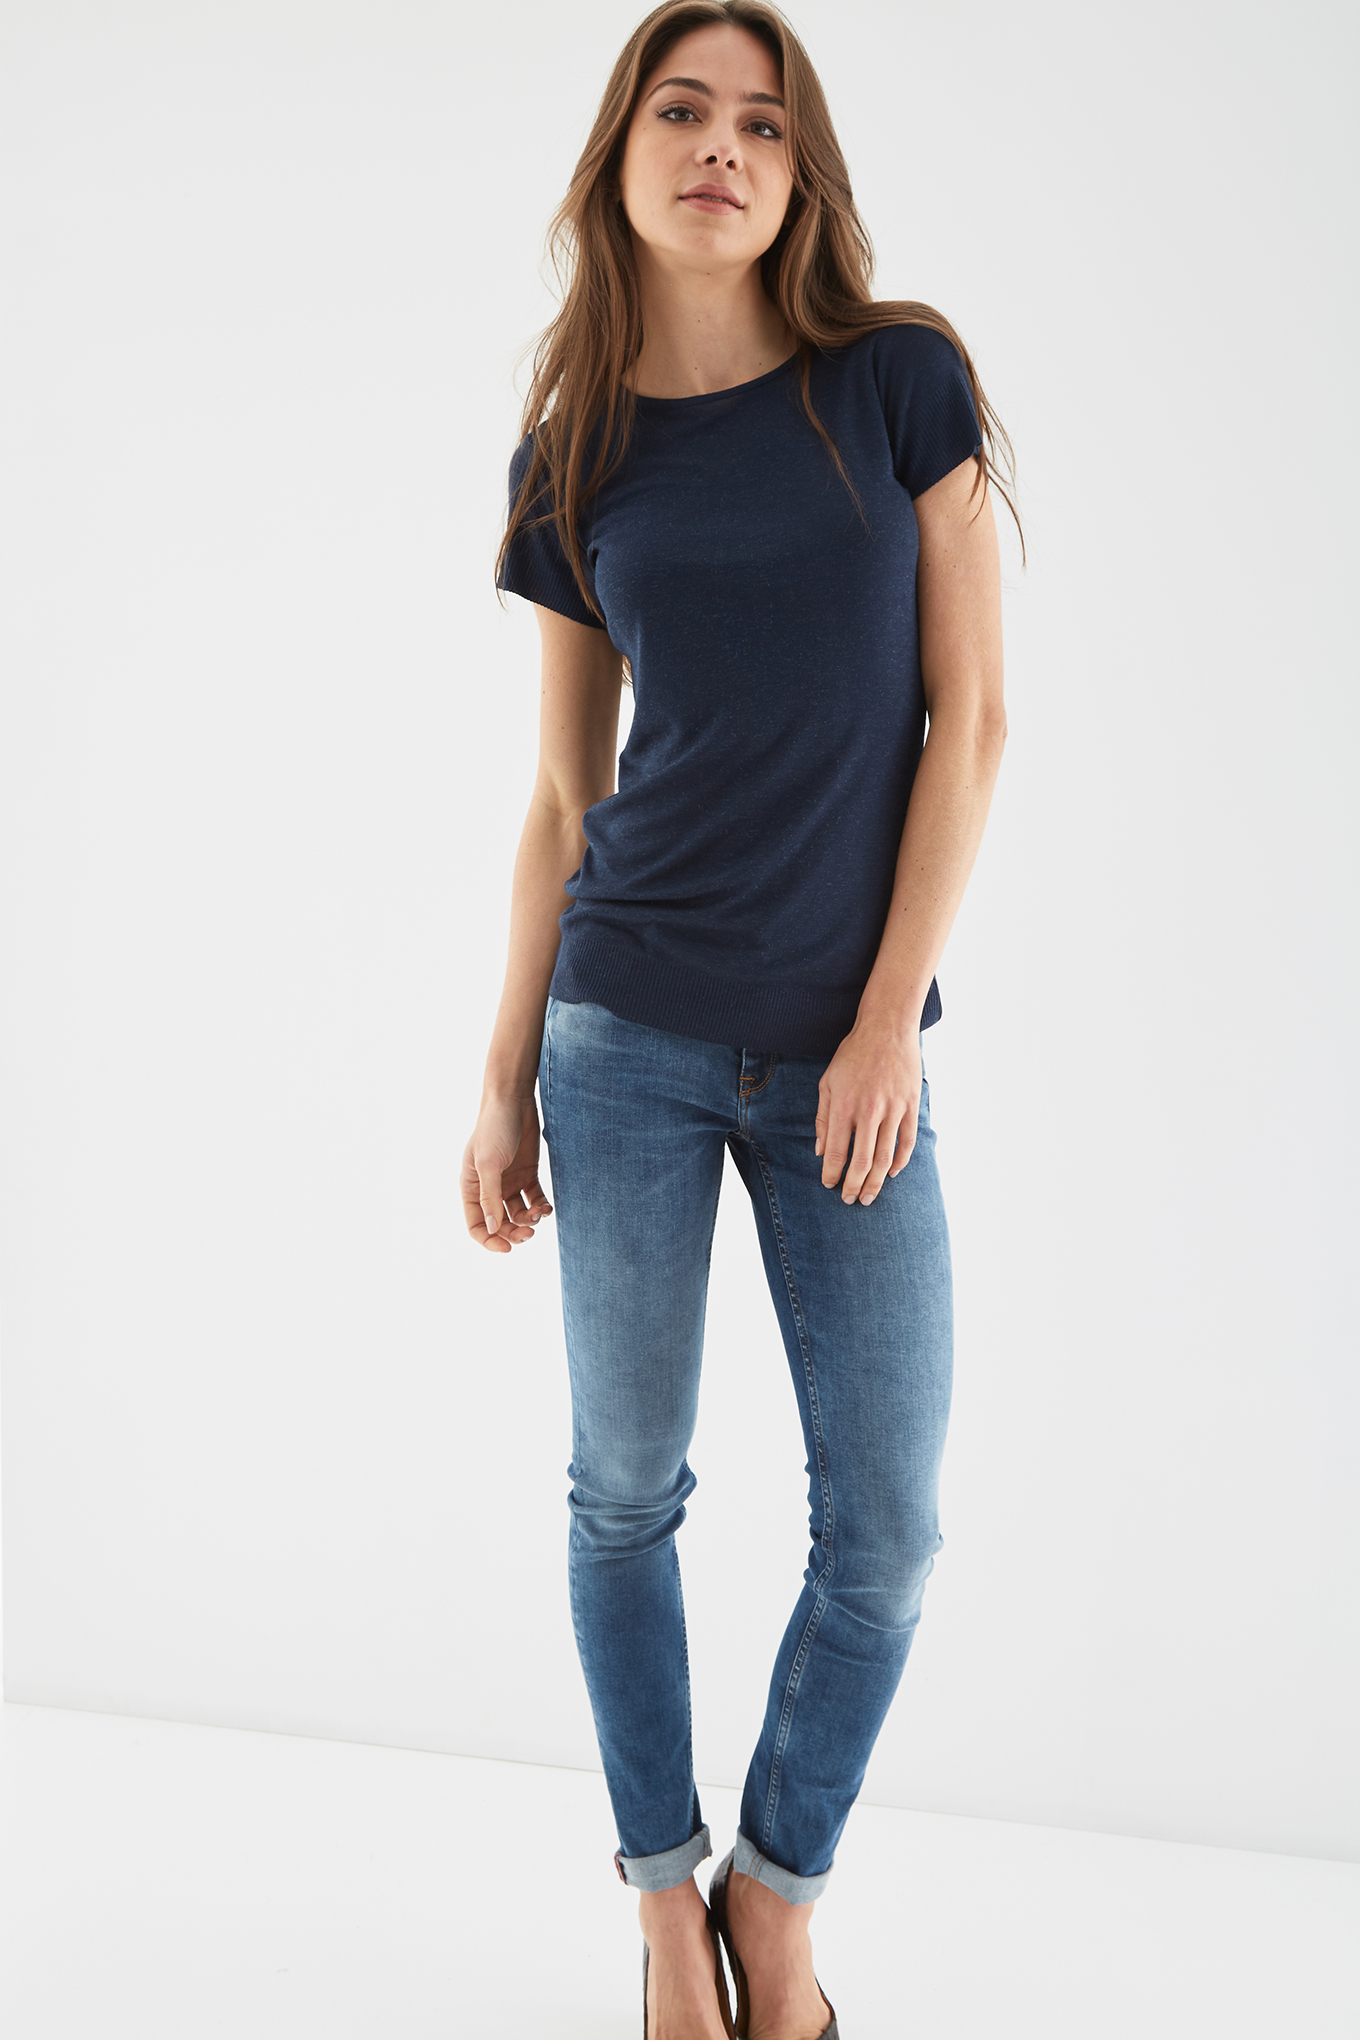 T-Shirt Azul Escuro Casual Mulher